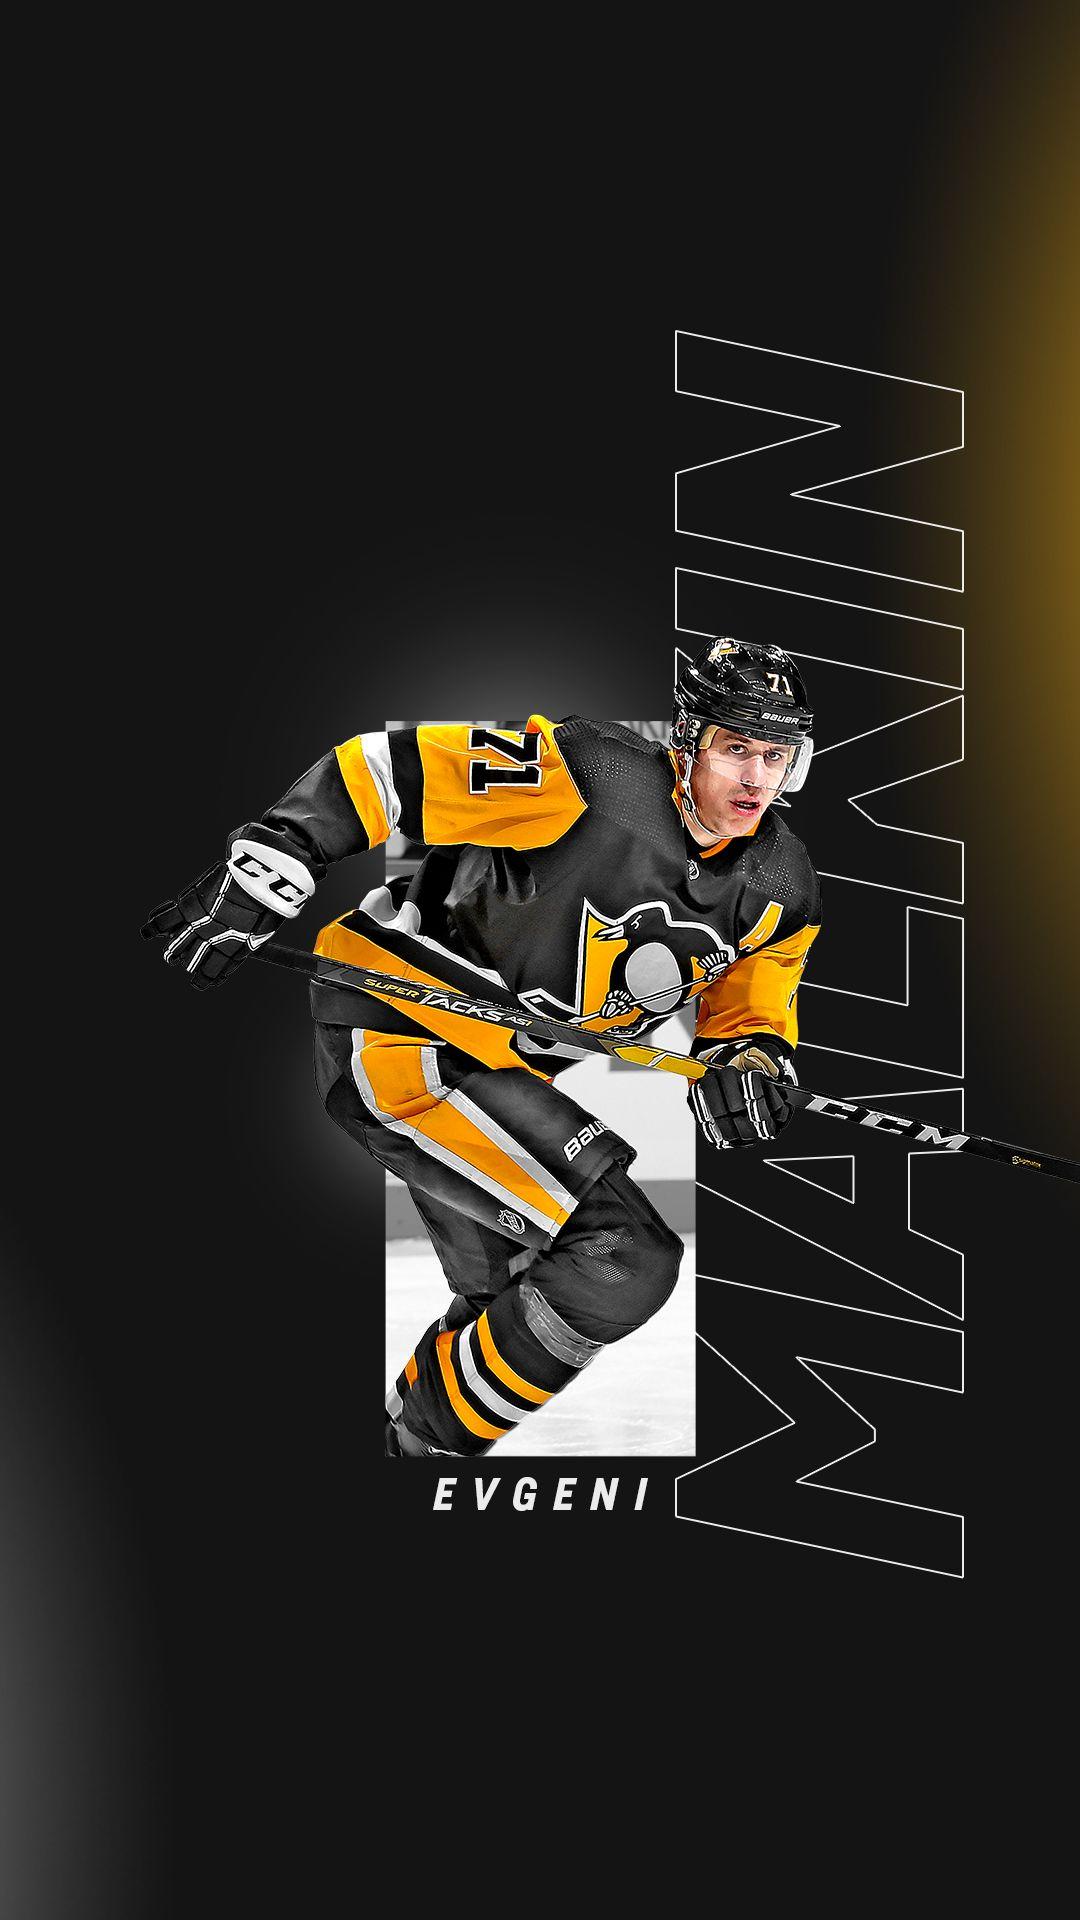 Pin by Terri Wilhelm on Pittsburgh Penguins in 2020 ...